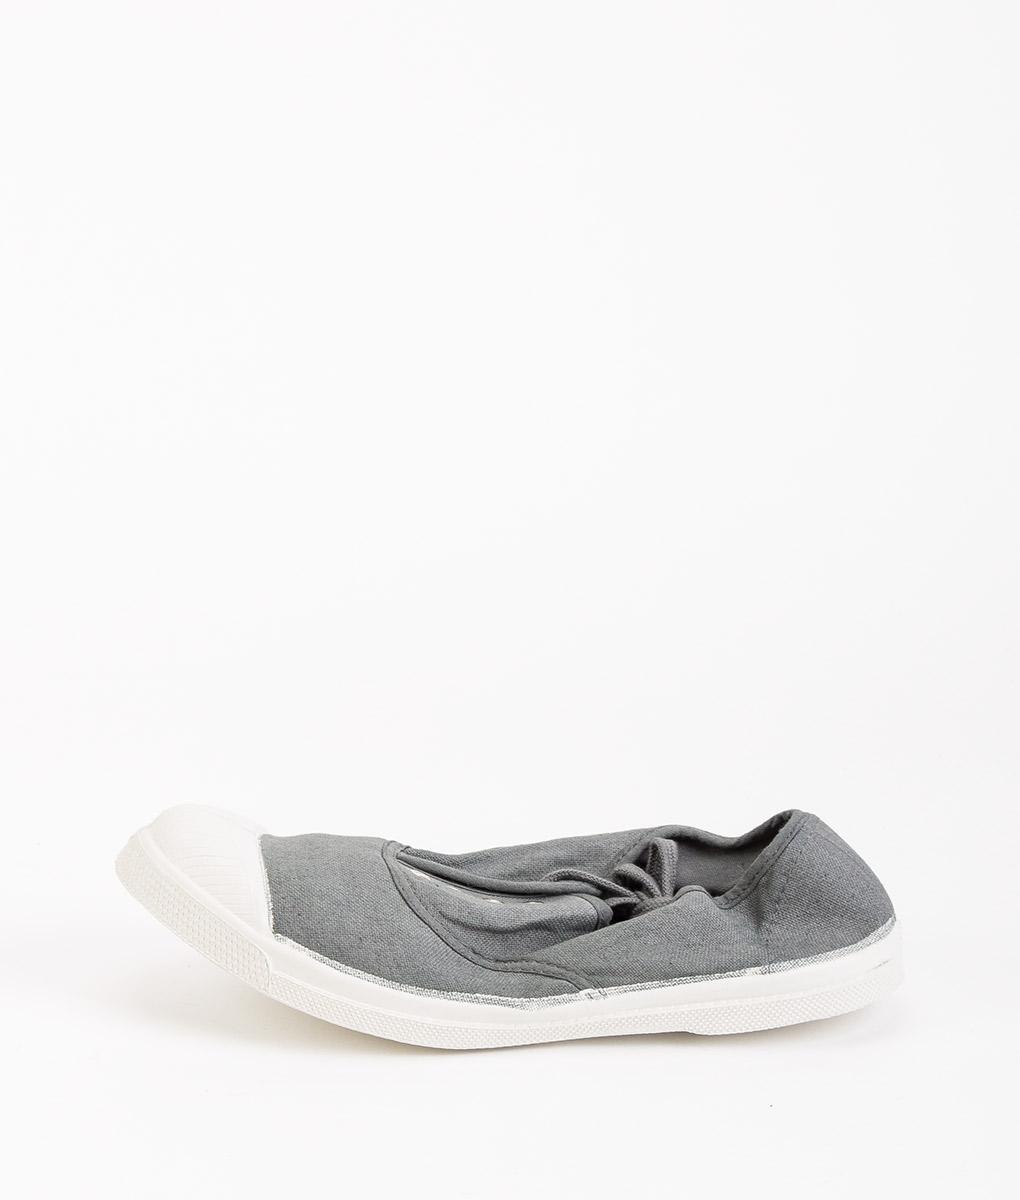 BENSIMON Women Sneakers 15004 TENNIS LACE, Gray 34.99